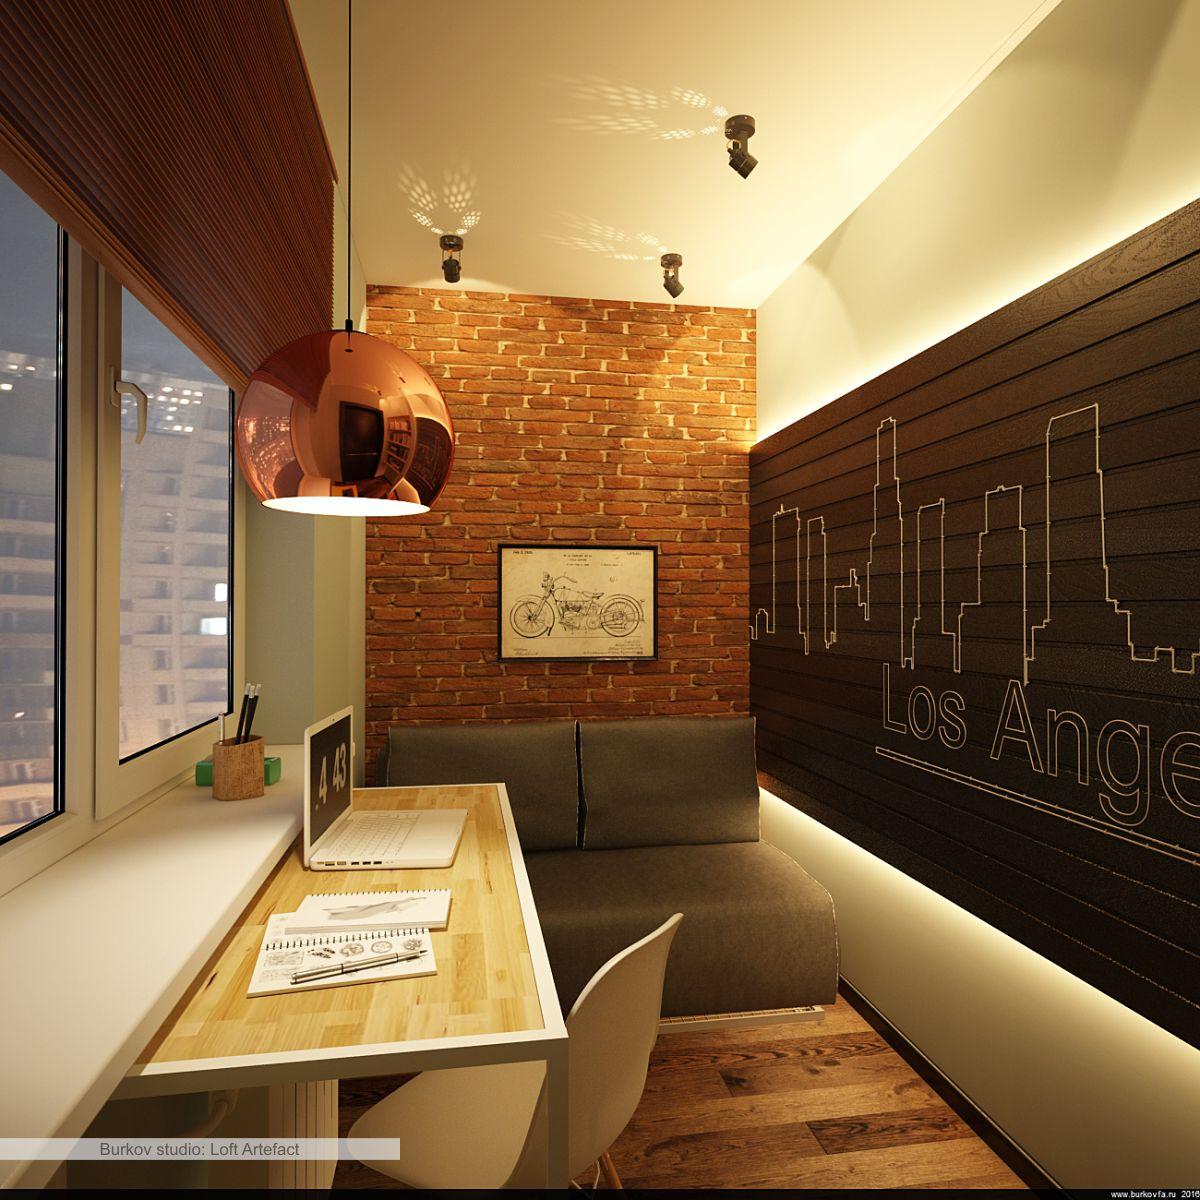 кабинет из маленькой комнаты